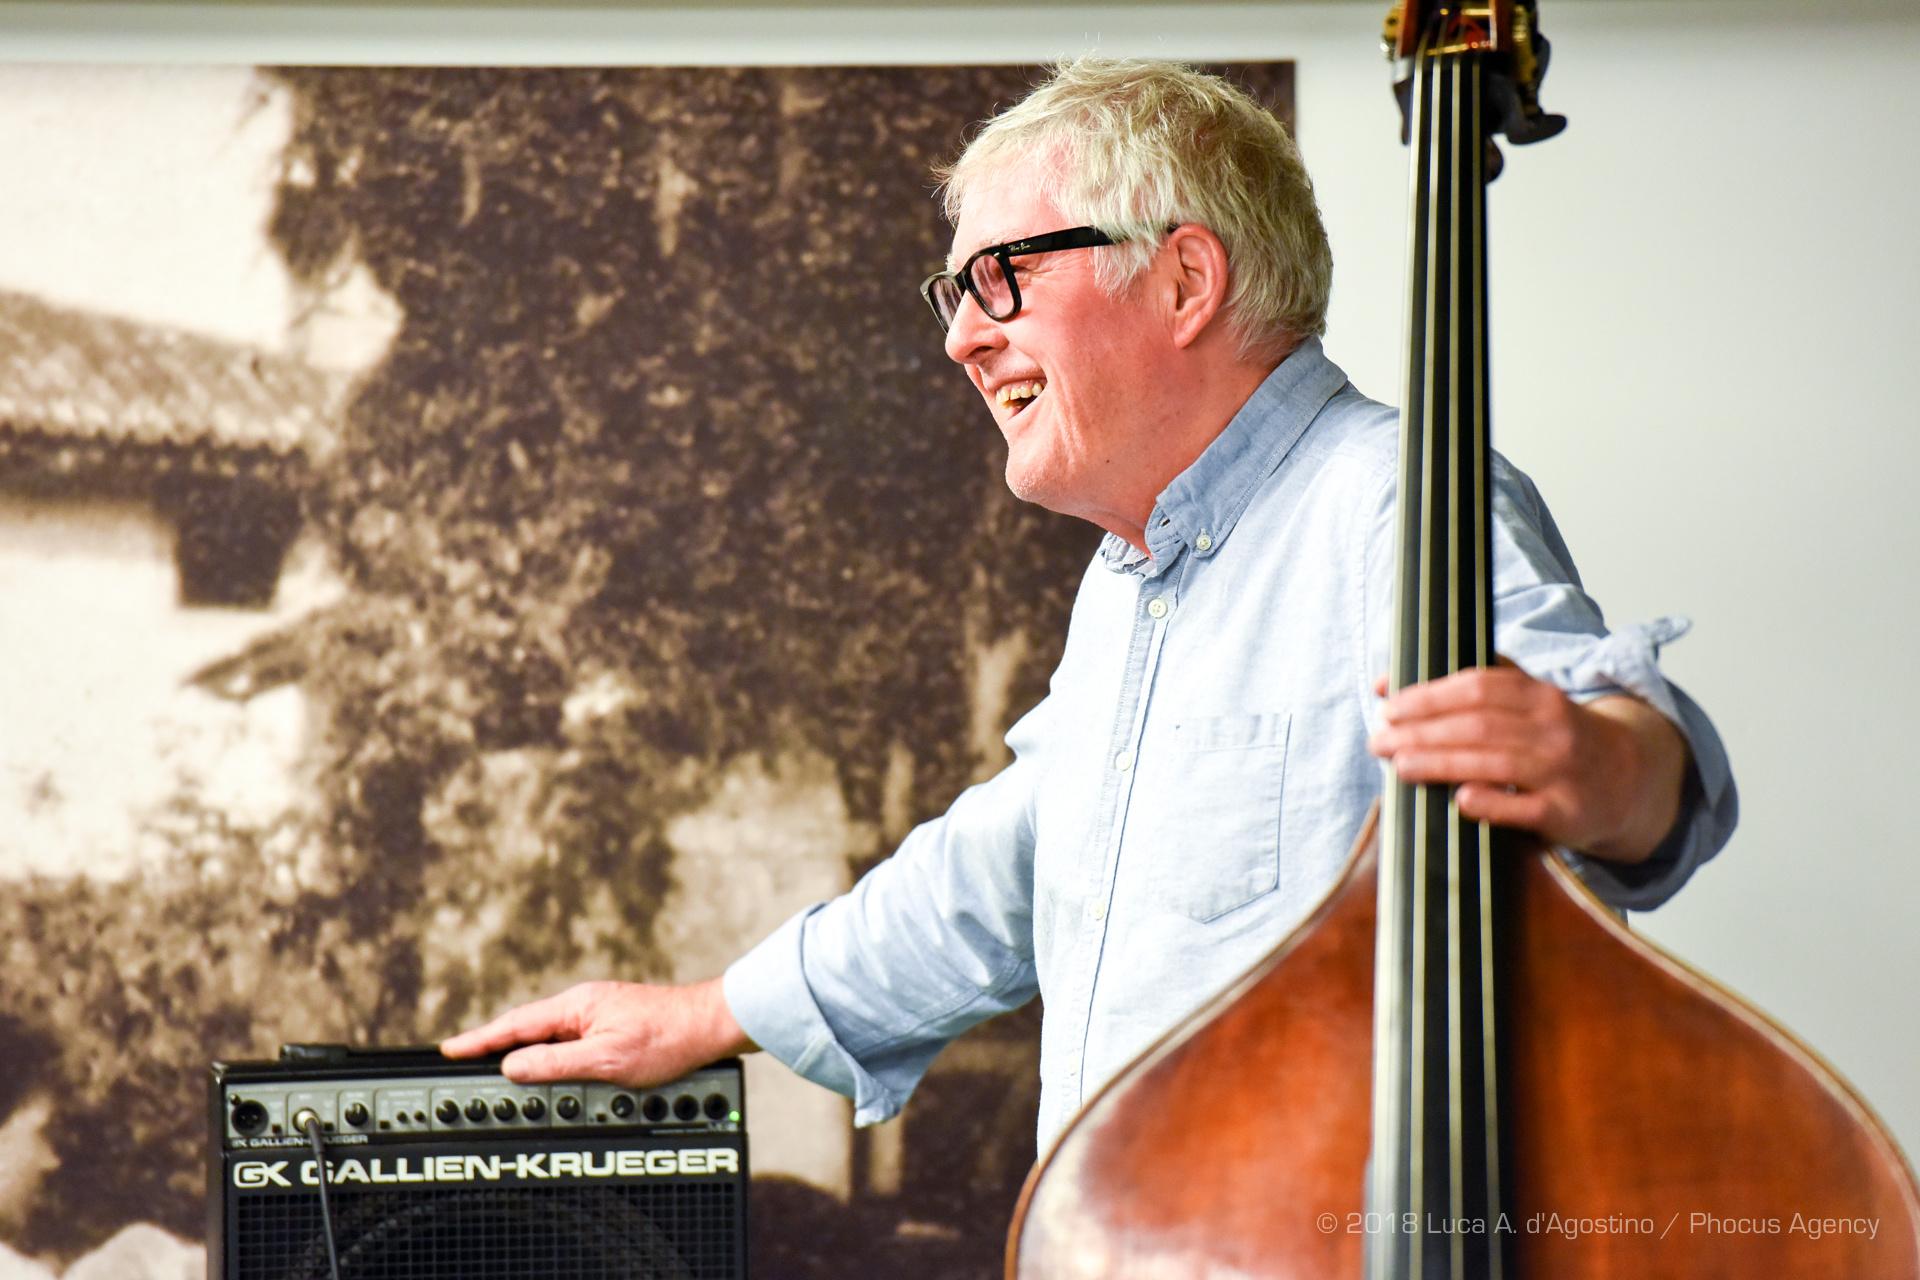 J&W - Arild Andersen Trio